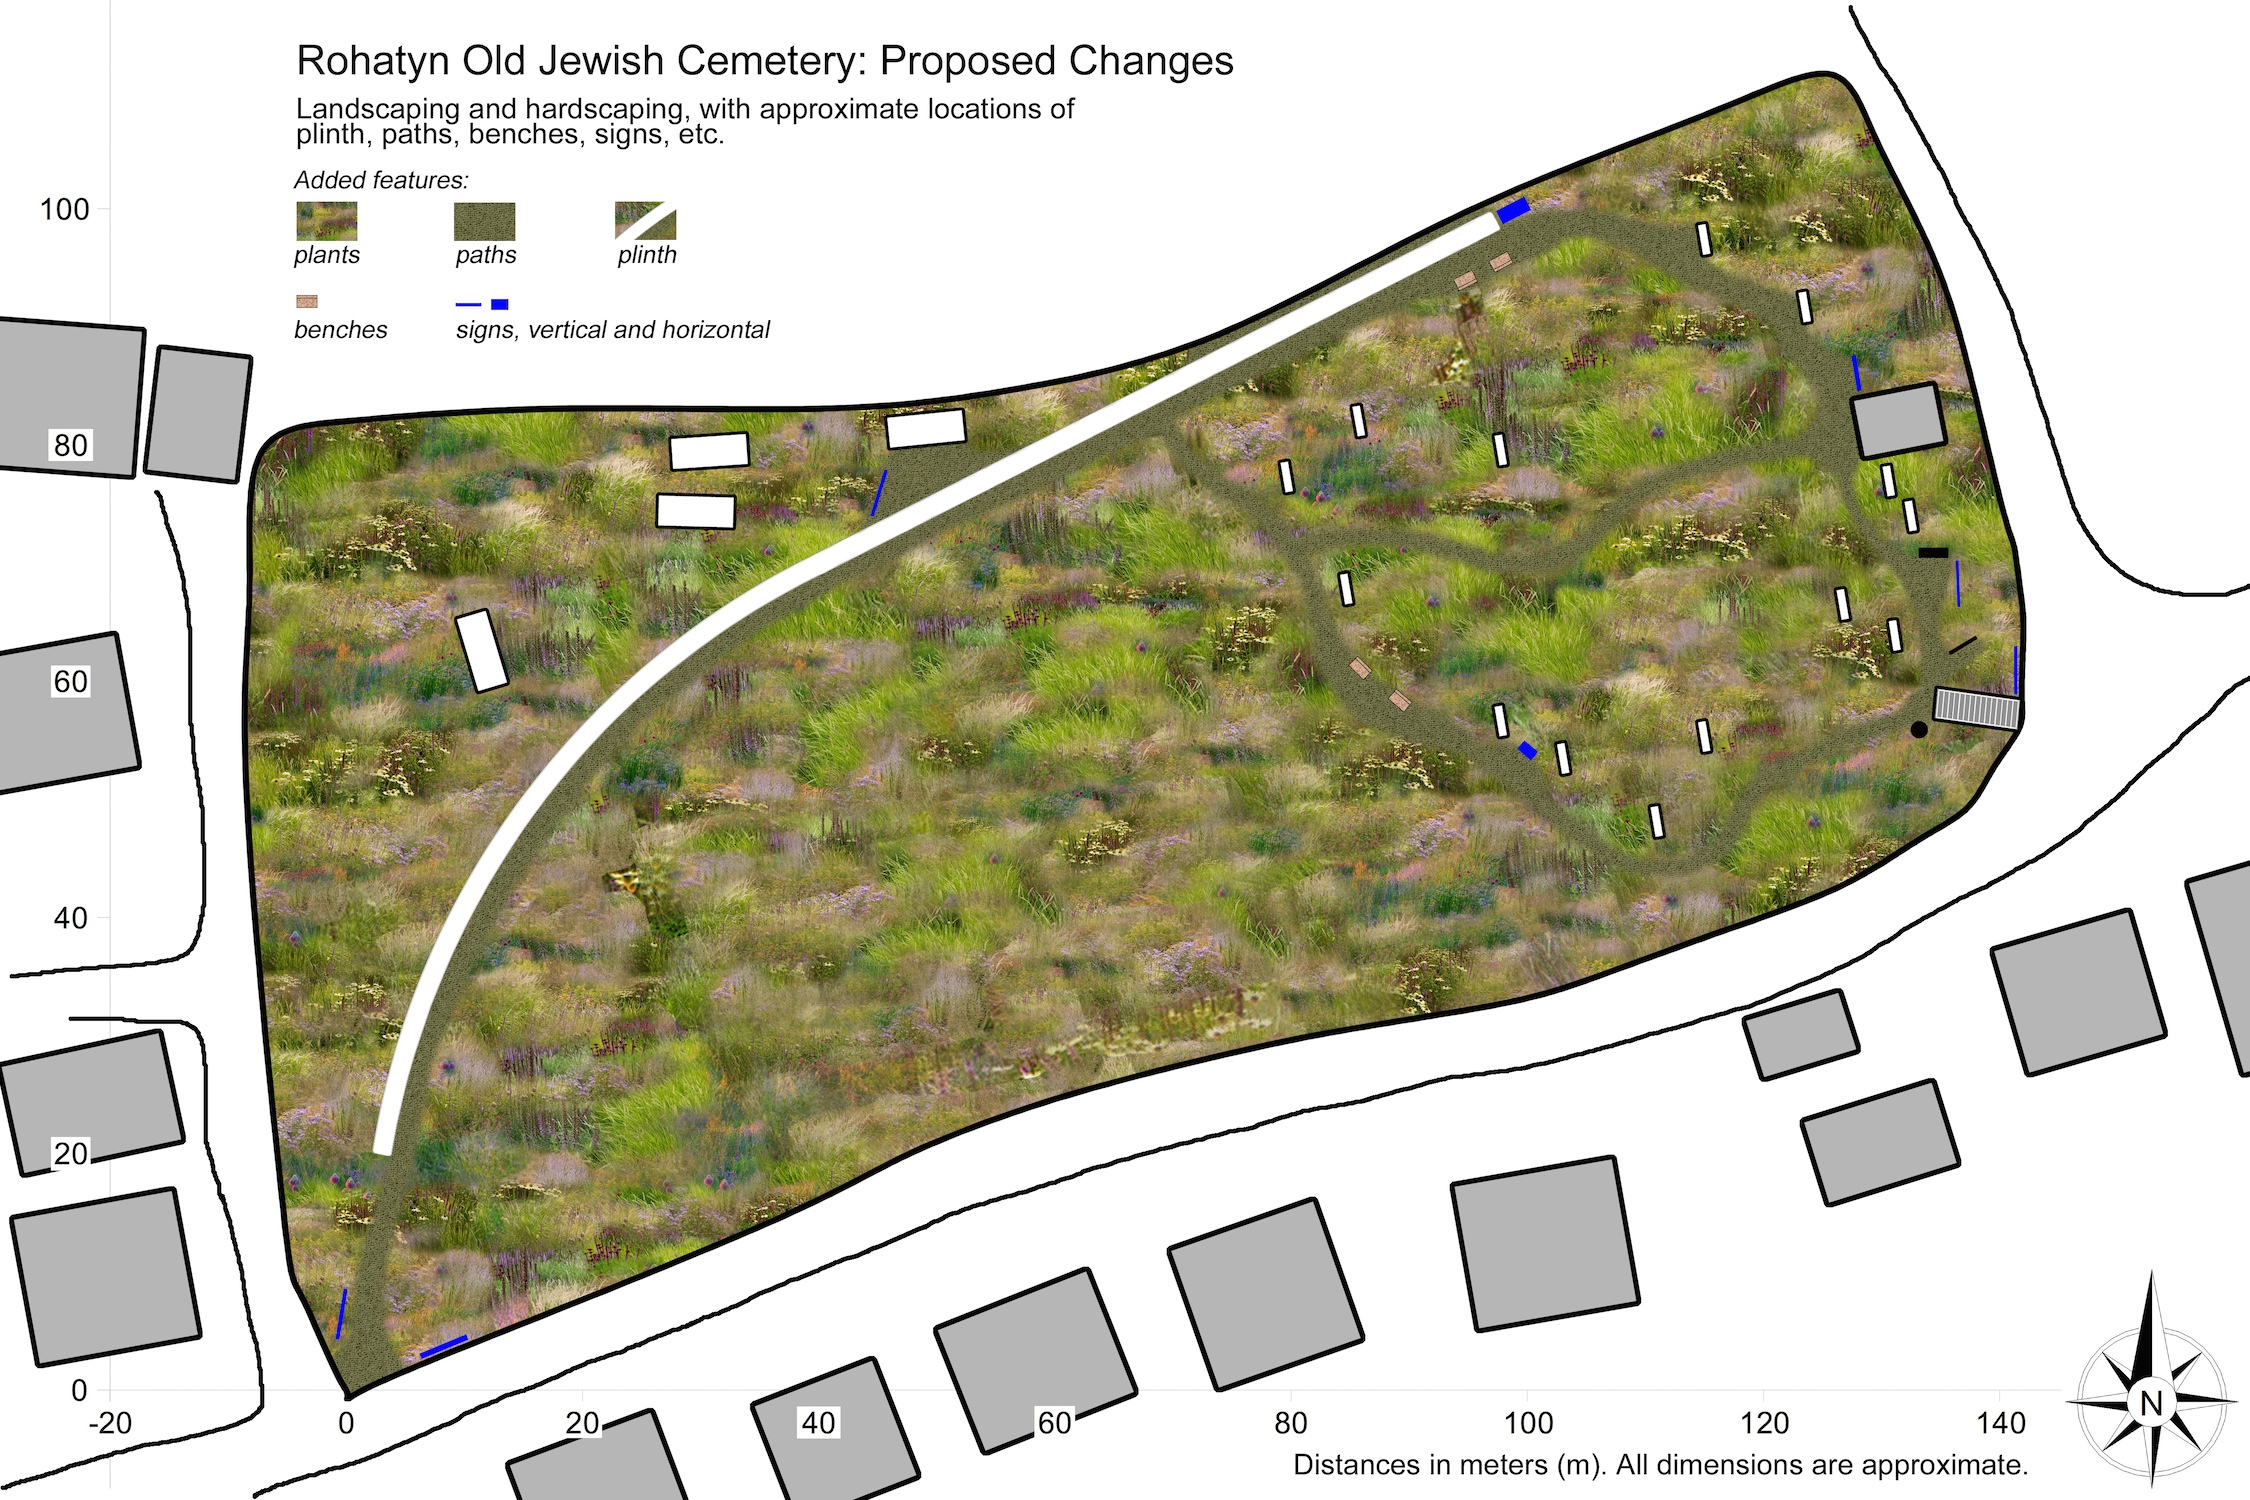 old jewish cemetery rehabilitation project u2013 rohatyn jewish heritage